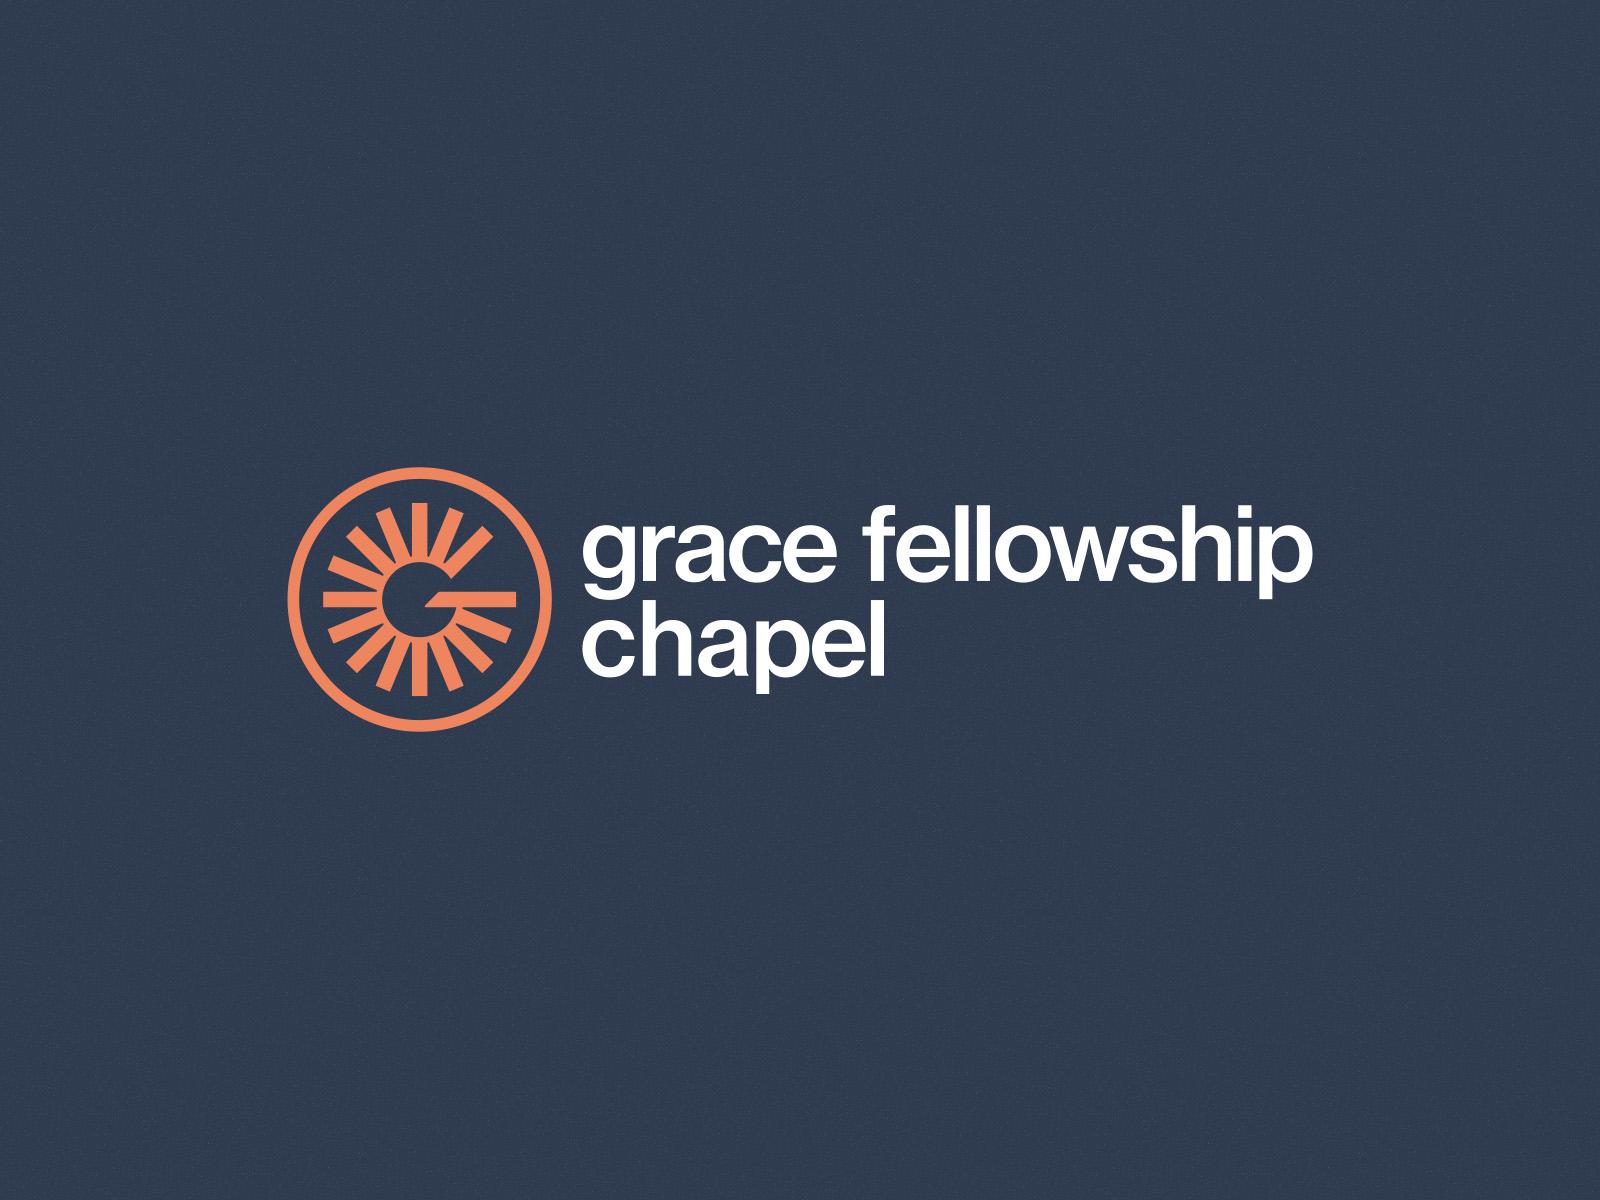 Grace Fellowship Chapel   Brand Identity & Website Design